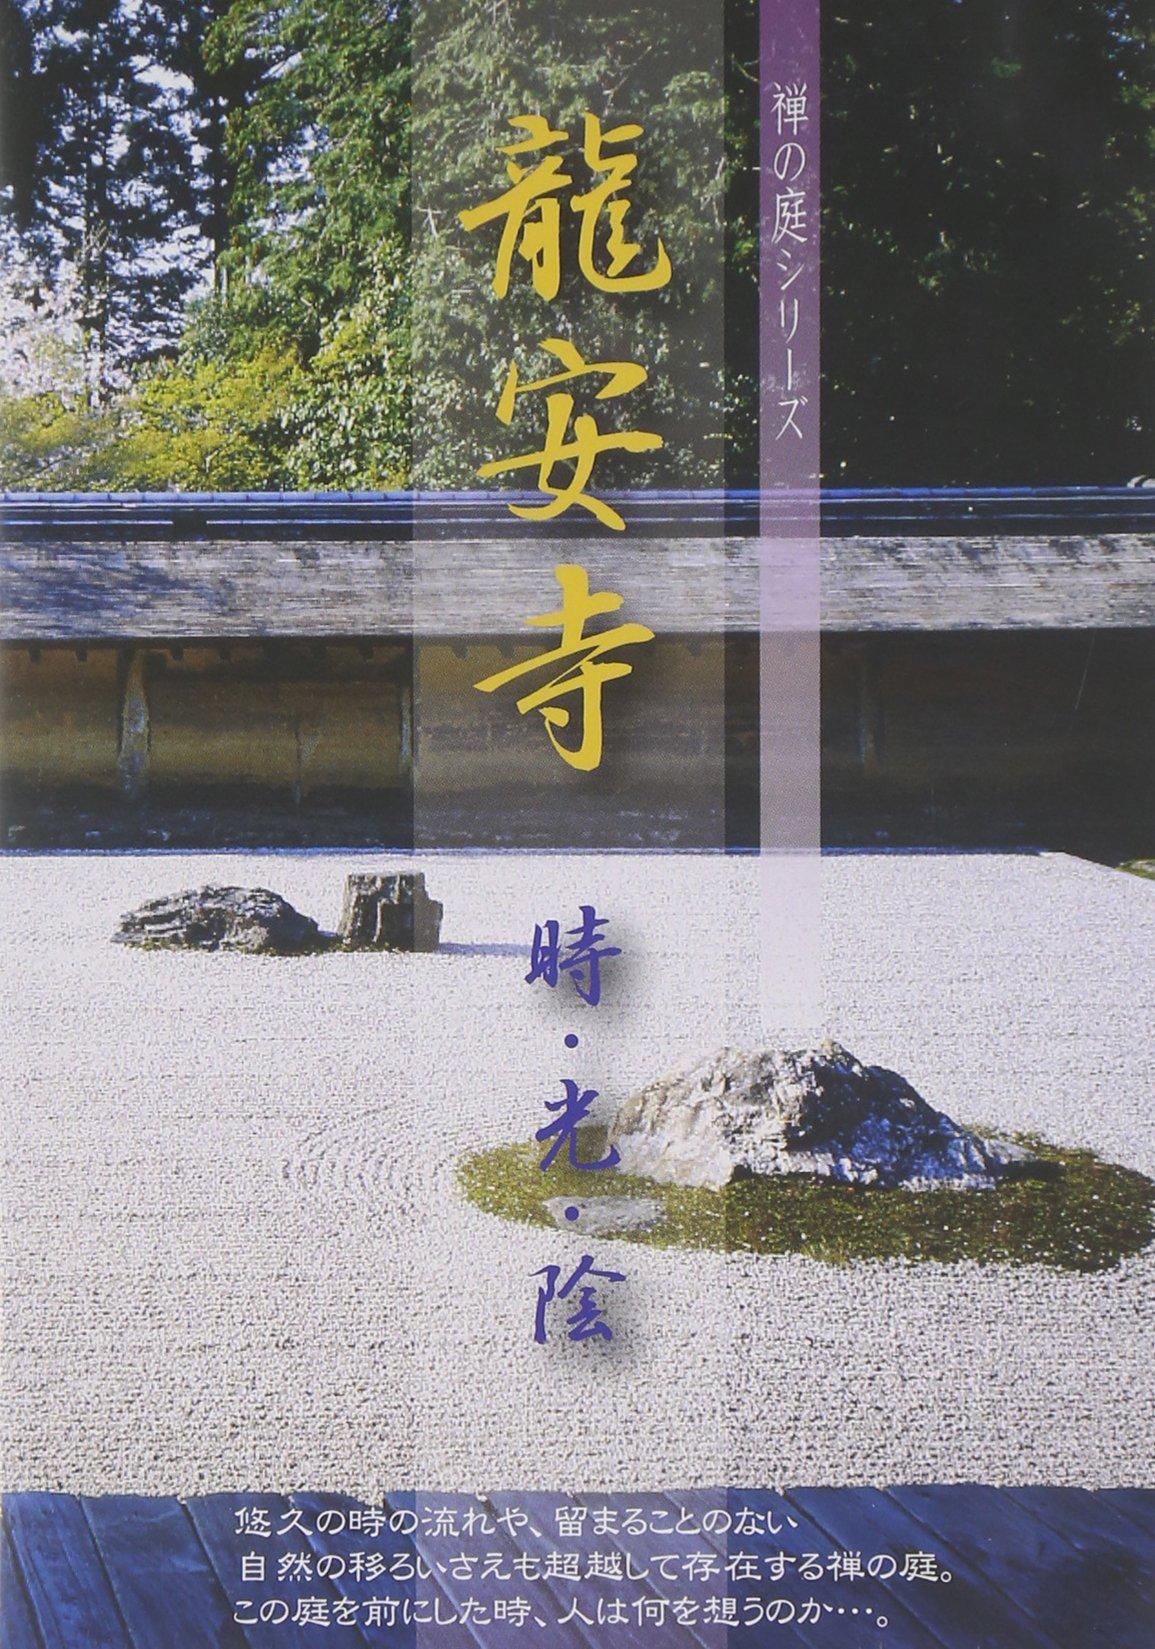 Garden at Ryoanji seriesA light and shade of DVD> Zen [Tankobon Hardcover]